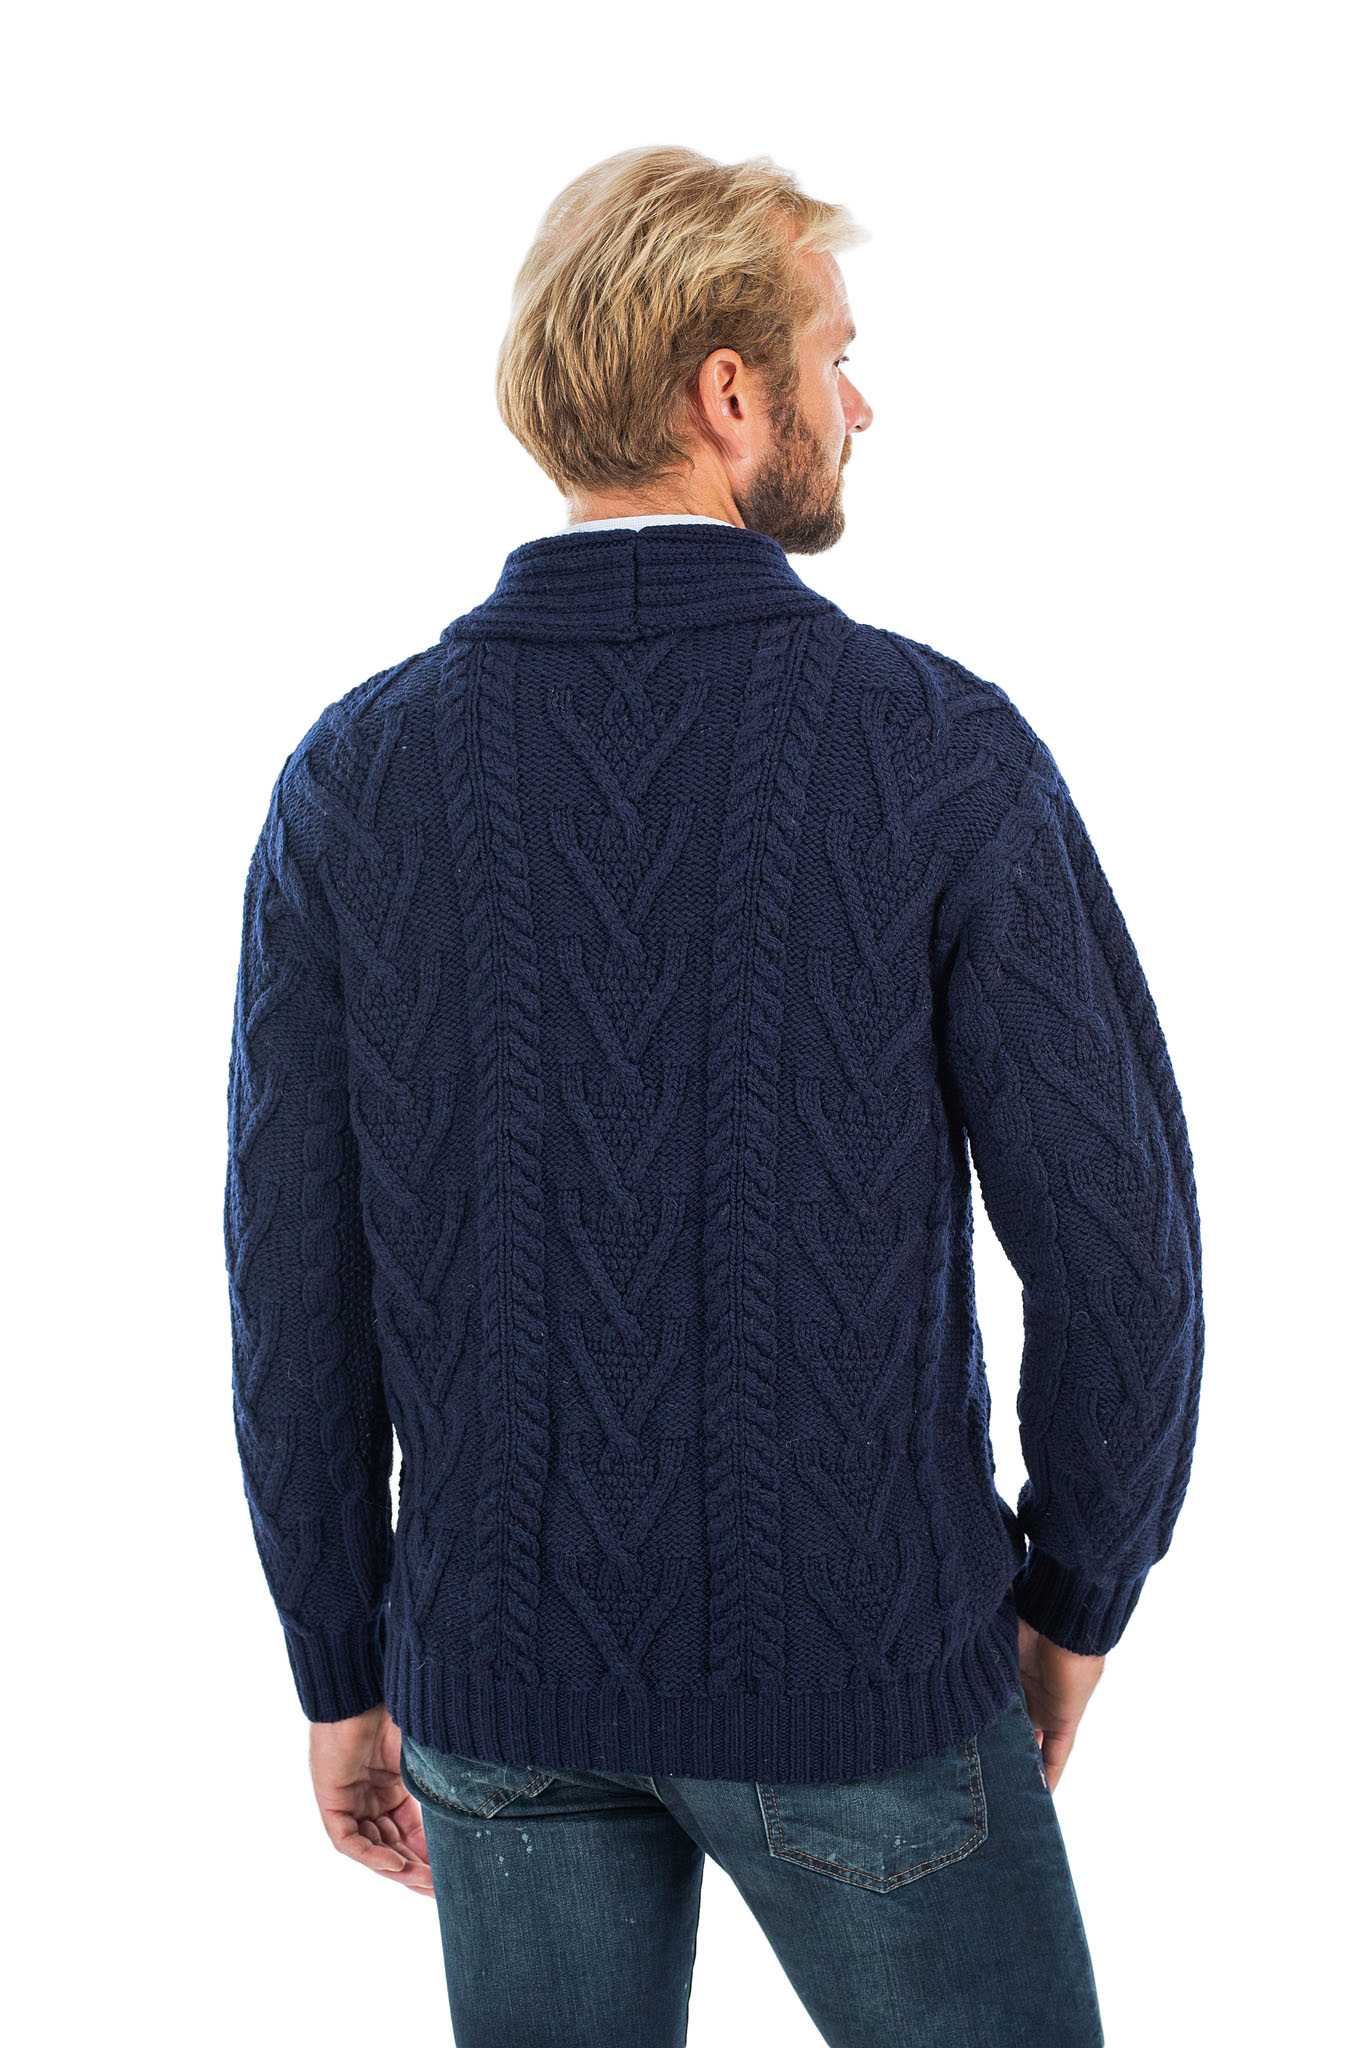 SAOL-Mens-Irish-Merino-Wool-Cardigan-Shawl-Collar-Front-Pockets-Aran-Cable-Knit thumbnail 25